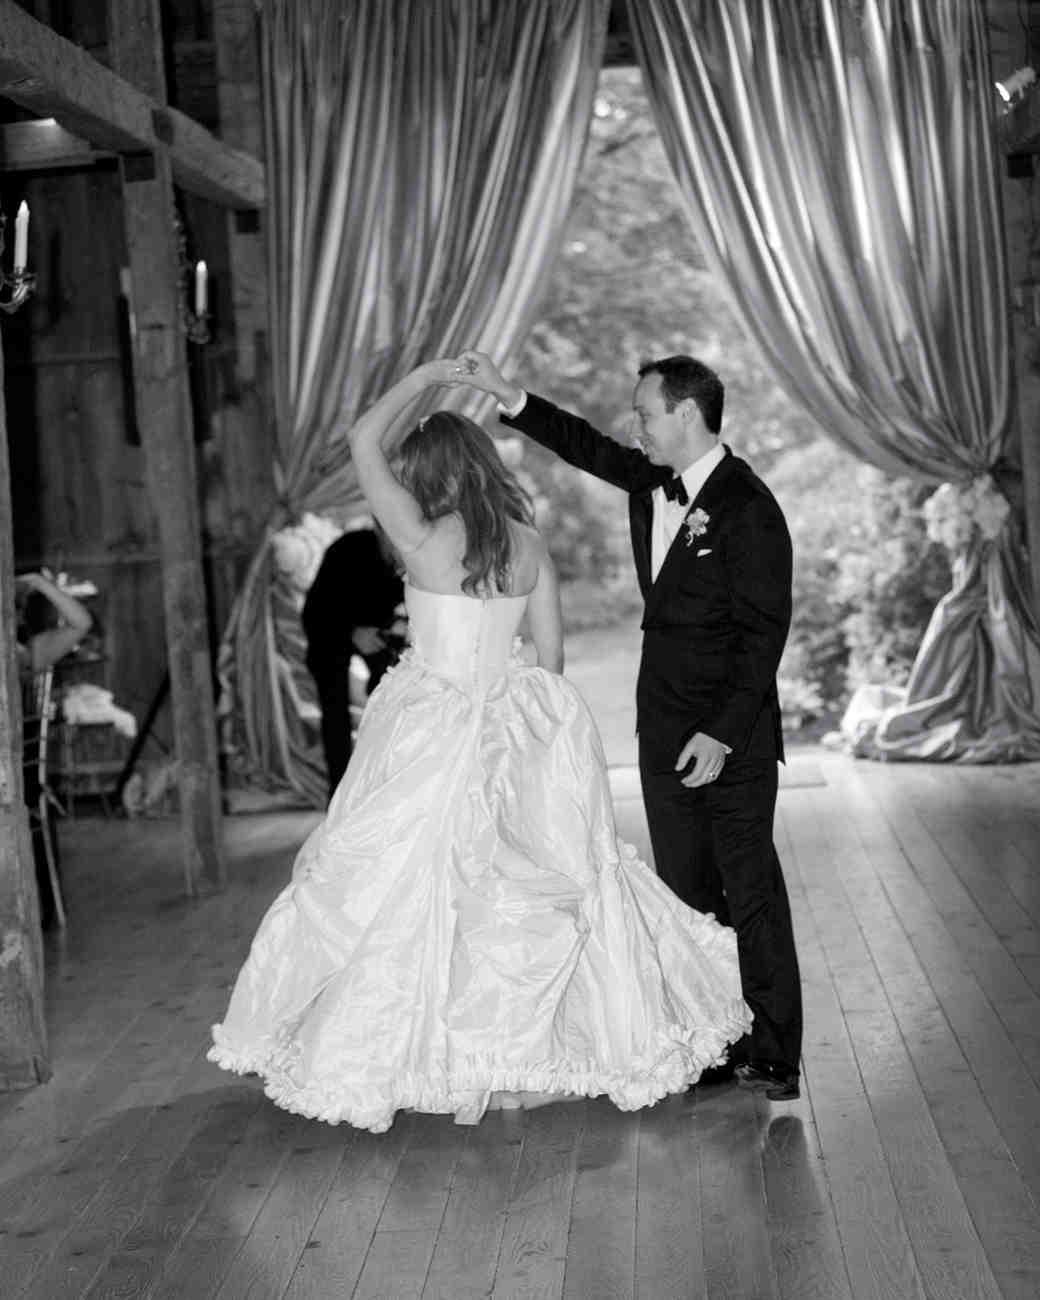 wedding-cover-bands-debbie-reifer-0814.jpg